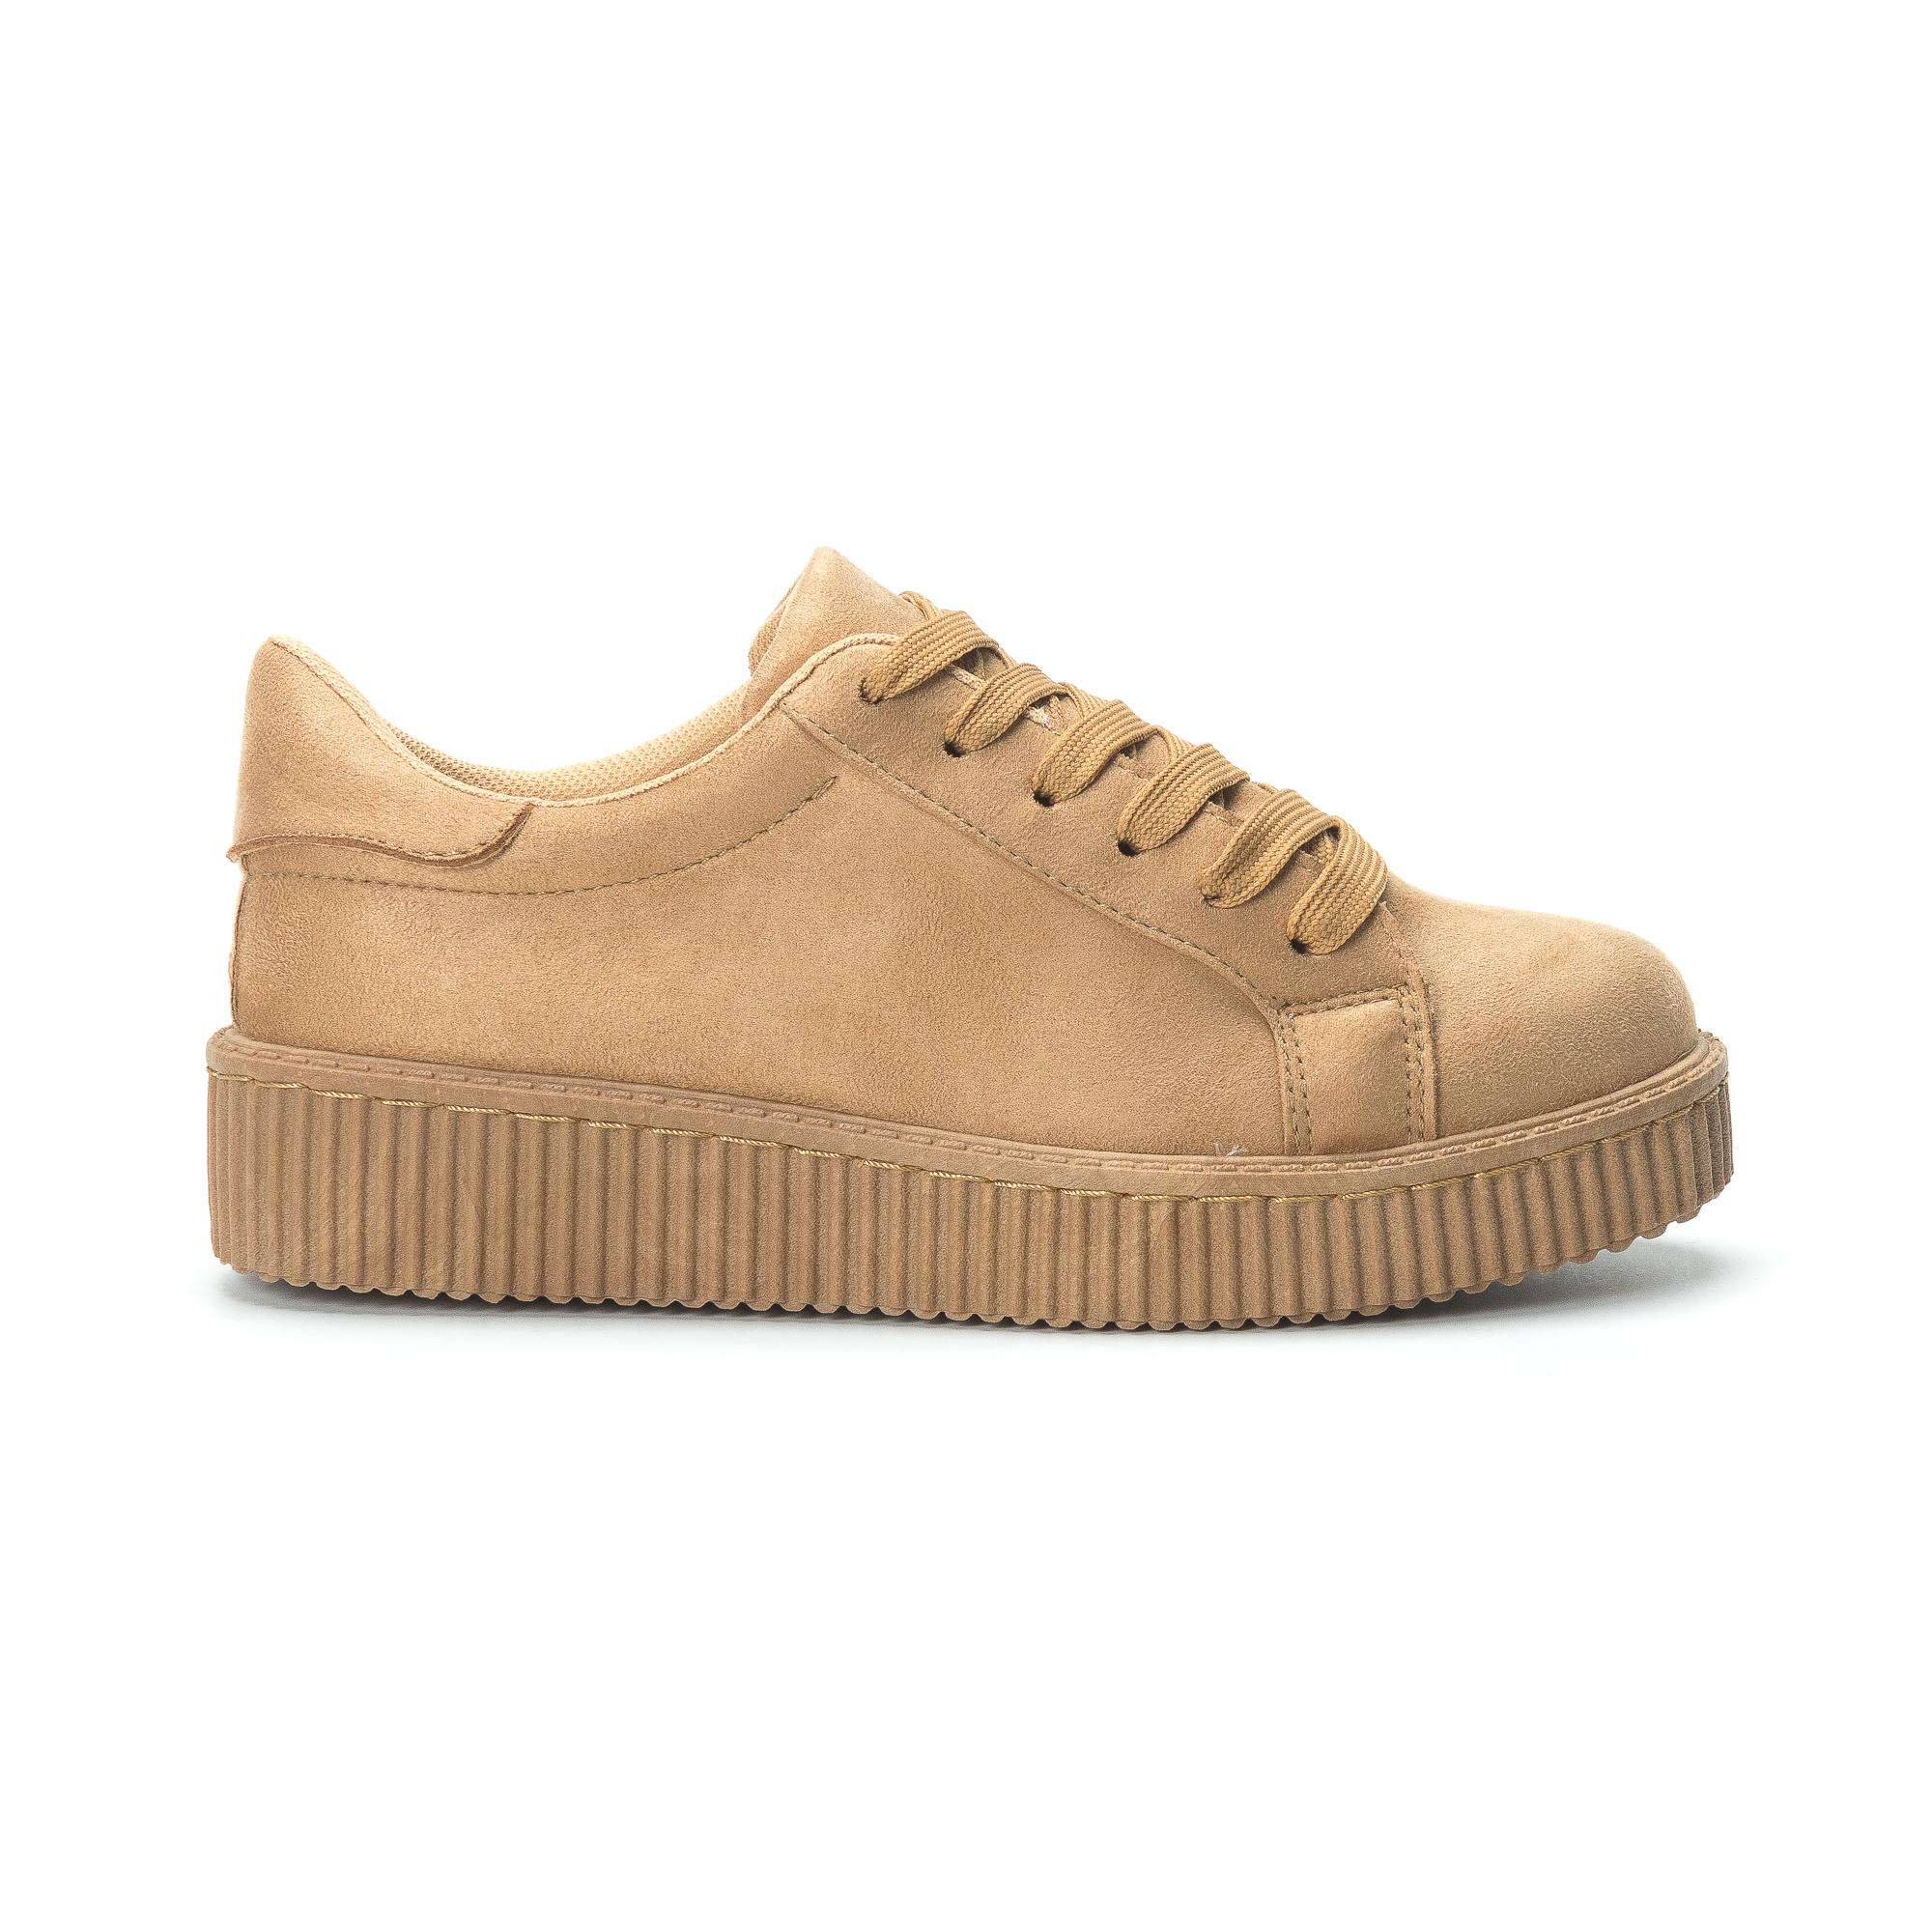 dc72228169e Γυναικεία μαύρα ψηλά Sneakers με χρυσές λεπτομέρειες 67825 ...